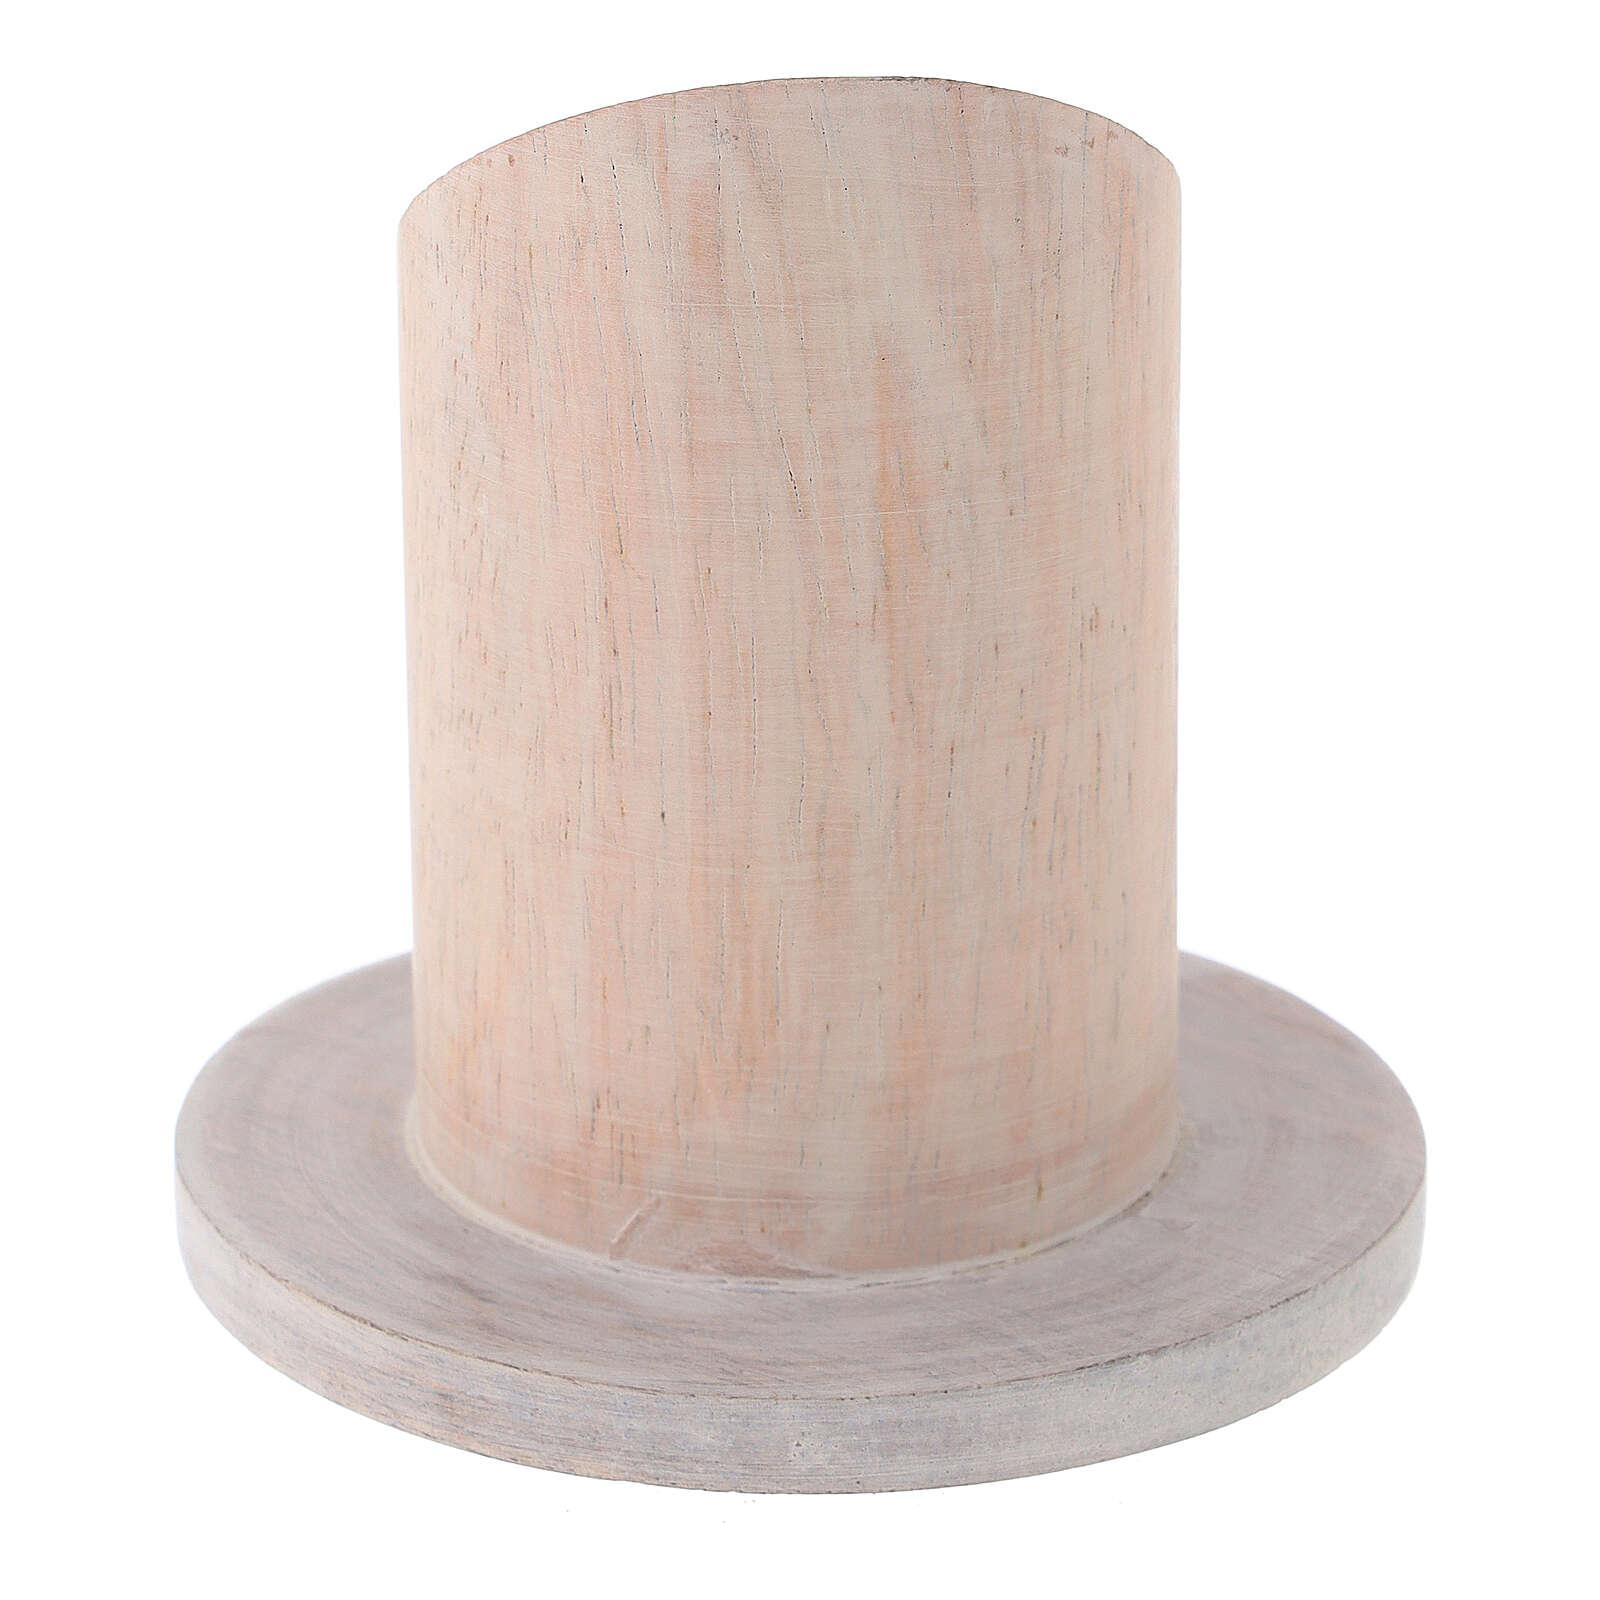 Base vela madera de mango claro diámetro 4 cm 3